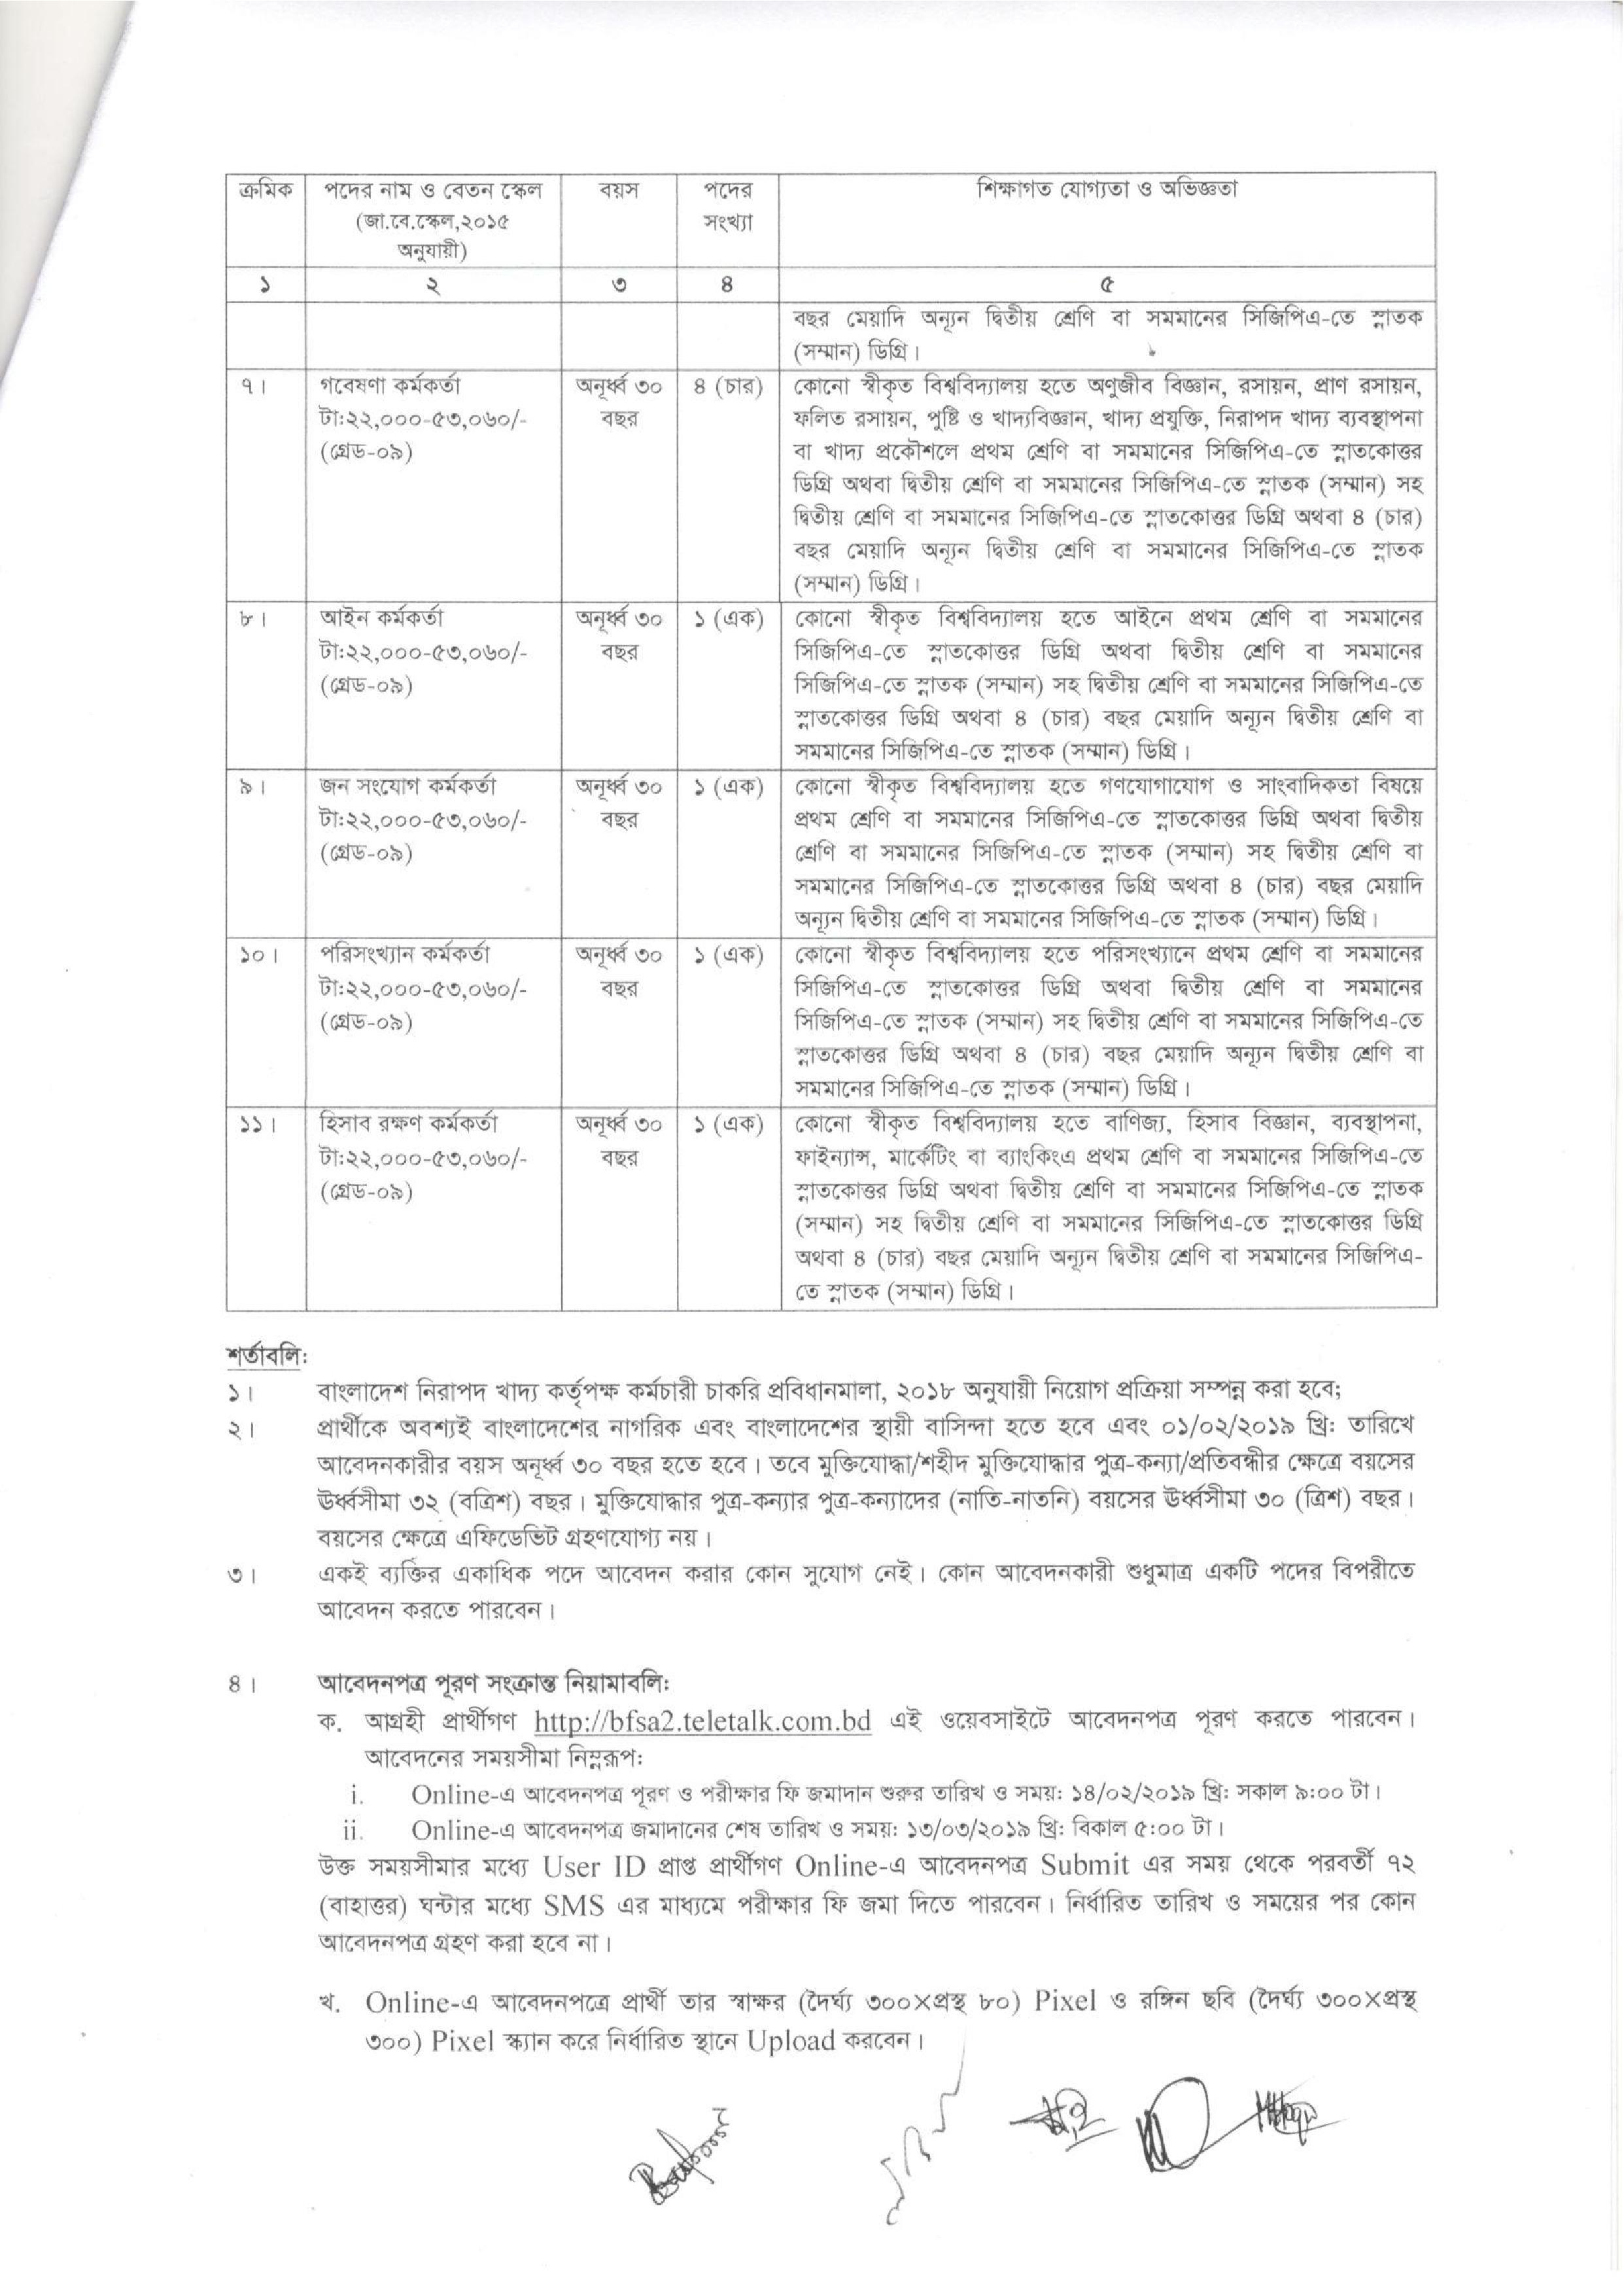 Bangladesh Food Safety Authority Job Circular 2019, Bangladesh Nirapad Khaddo Kortripokkho Chakri, BFSA Recruitment, বাংলাদেশ নিরাপদ খাদ্য কর্তৃপক্ষ নিয়োগ বিজ্ঞপ্তি